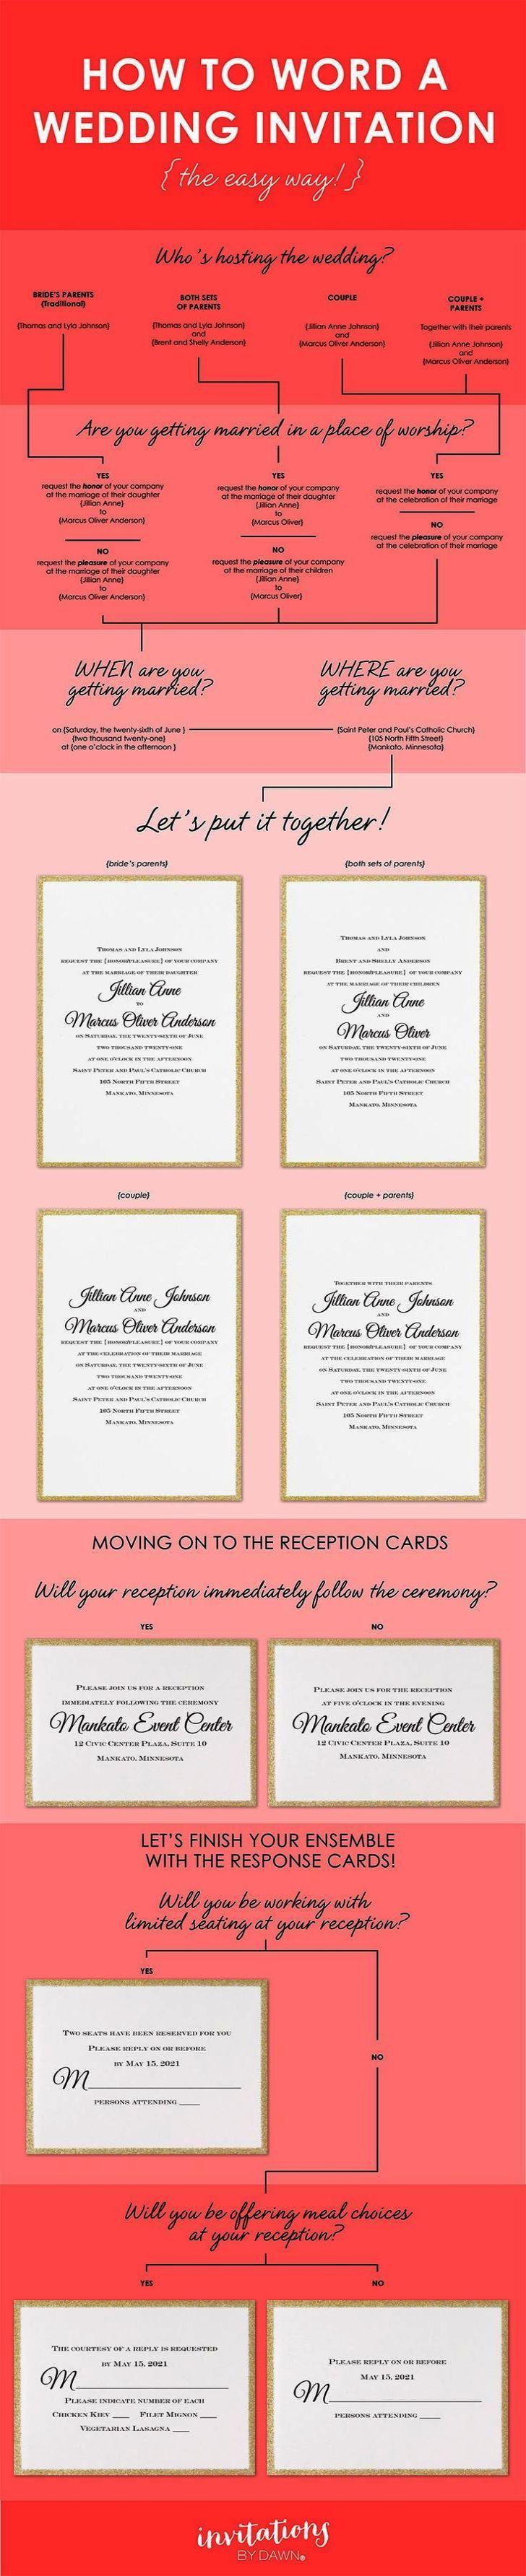 Wedding Invitations Jr Traditional Wedding Invitation Card Template ...